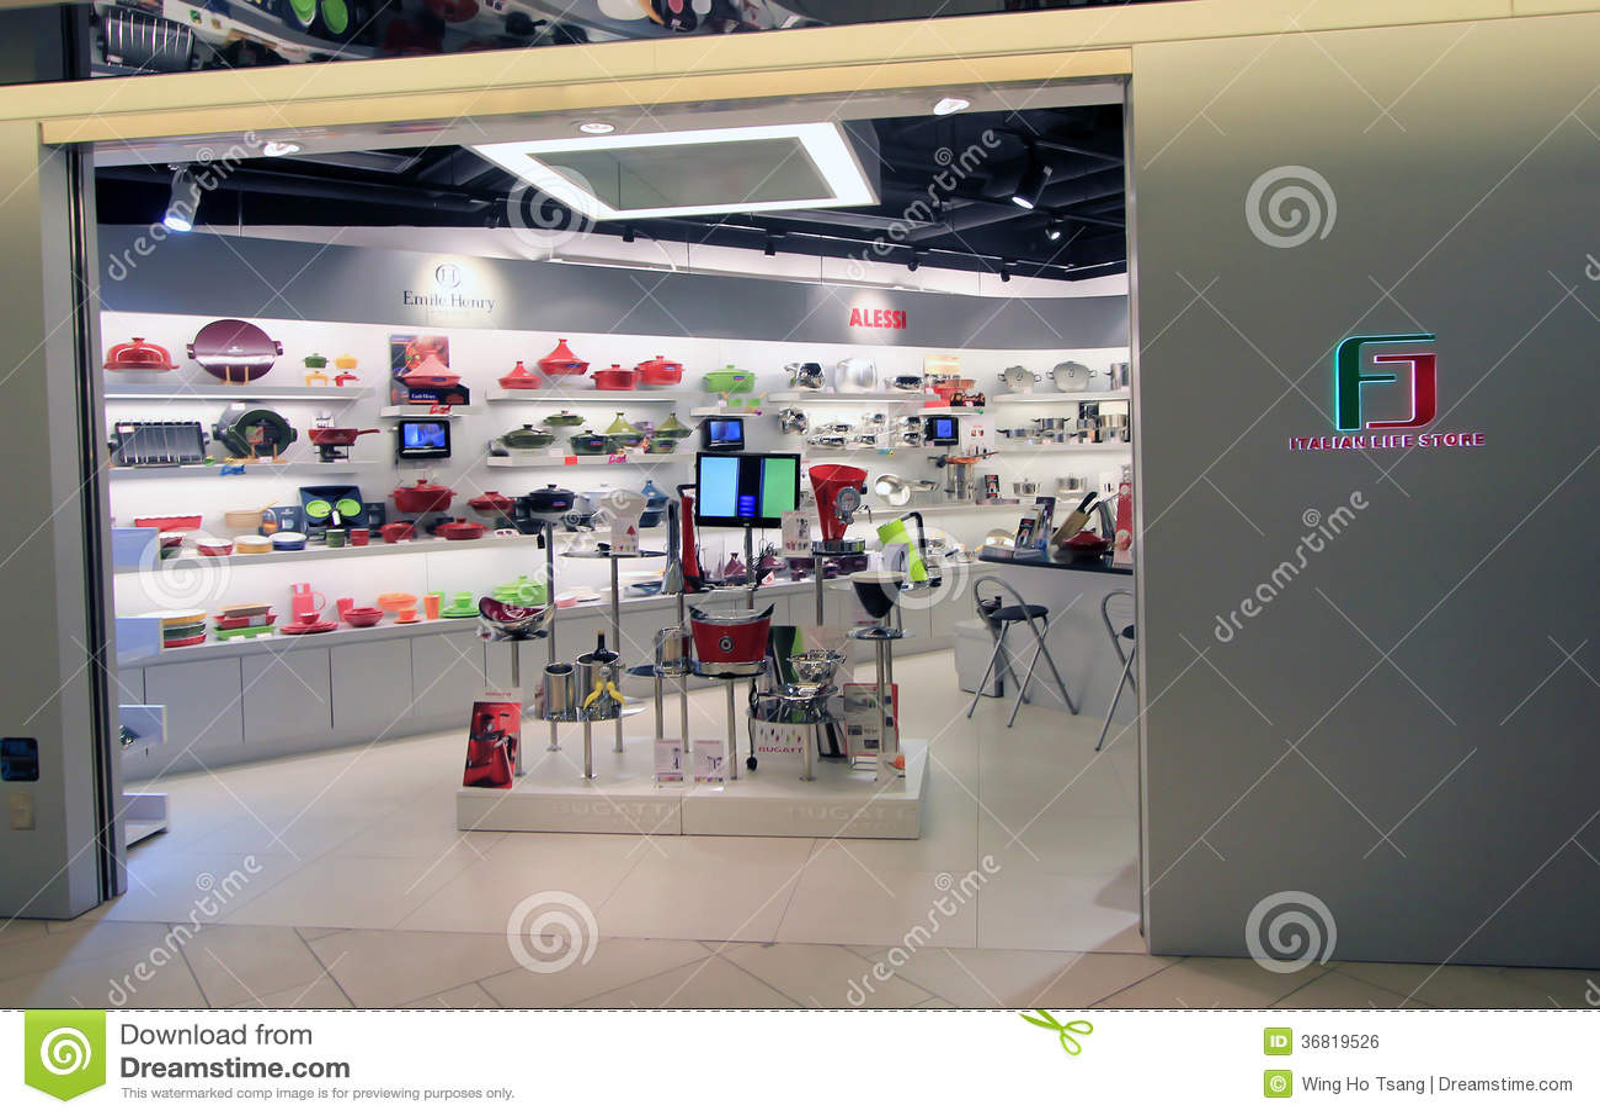 Italian Life Store In Hong Kong Editorial Photo - Image of shop ... 68c23d33d06e